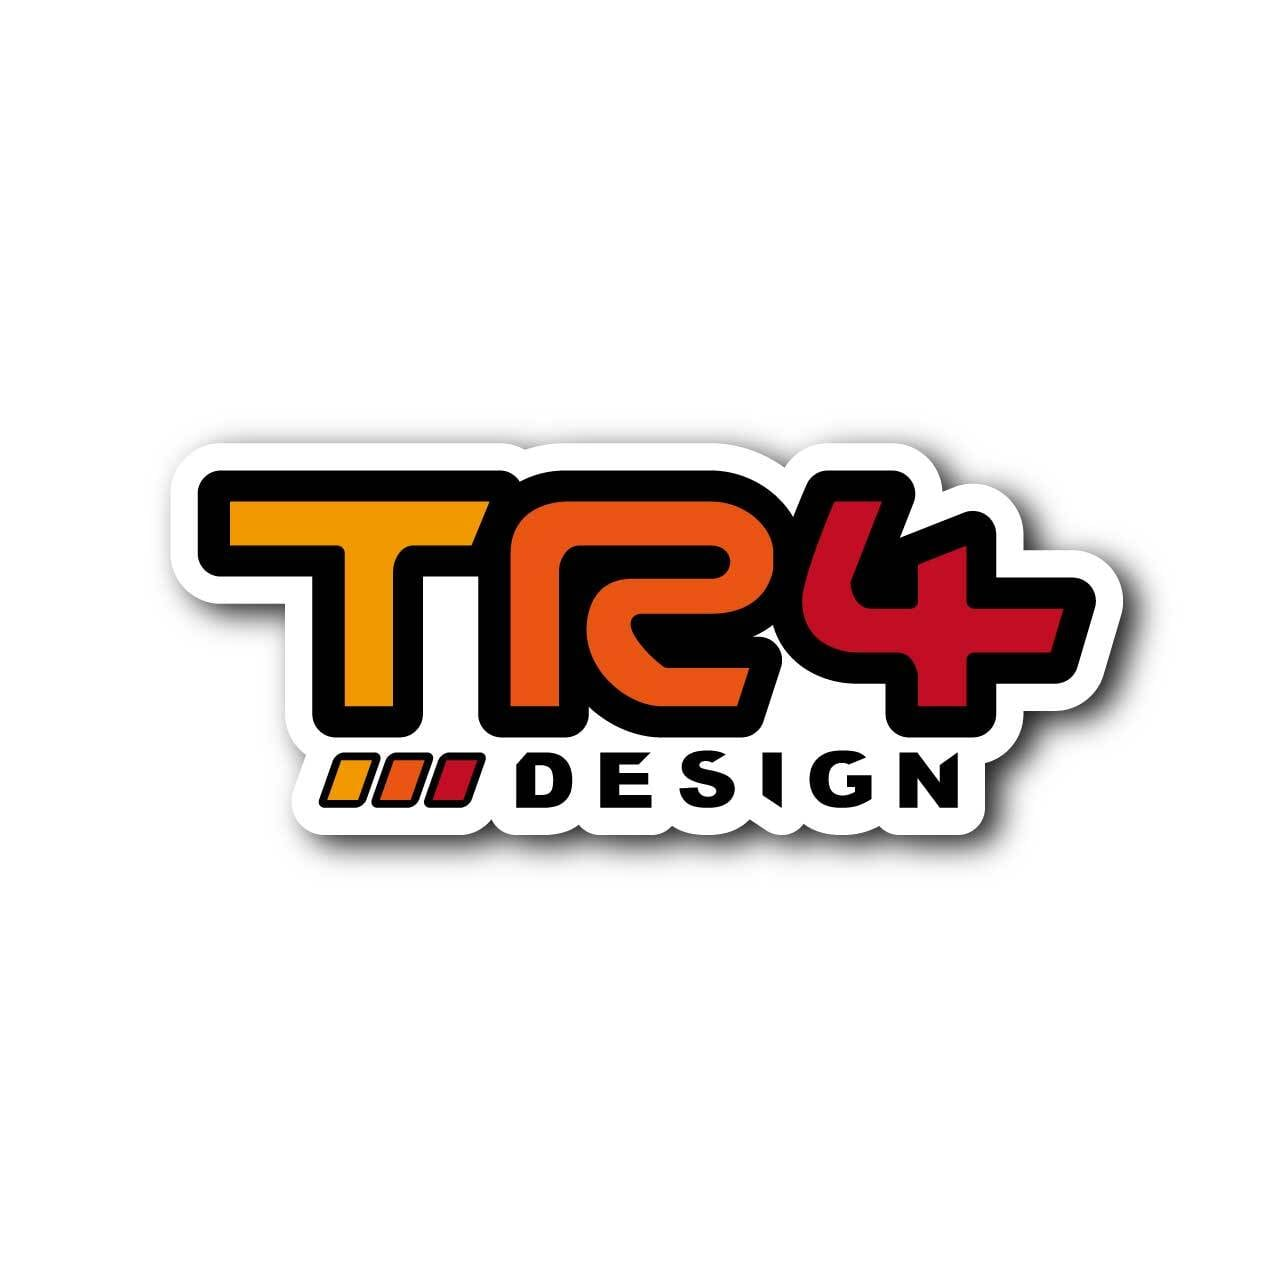 【 TR4Design 】TR4Design Sticker Decal #02